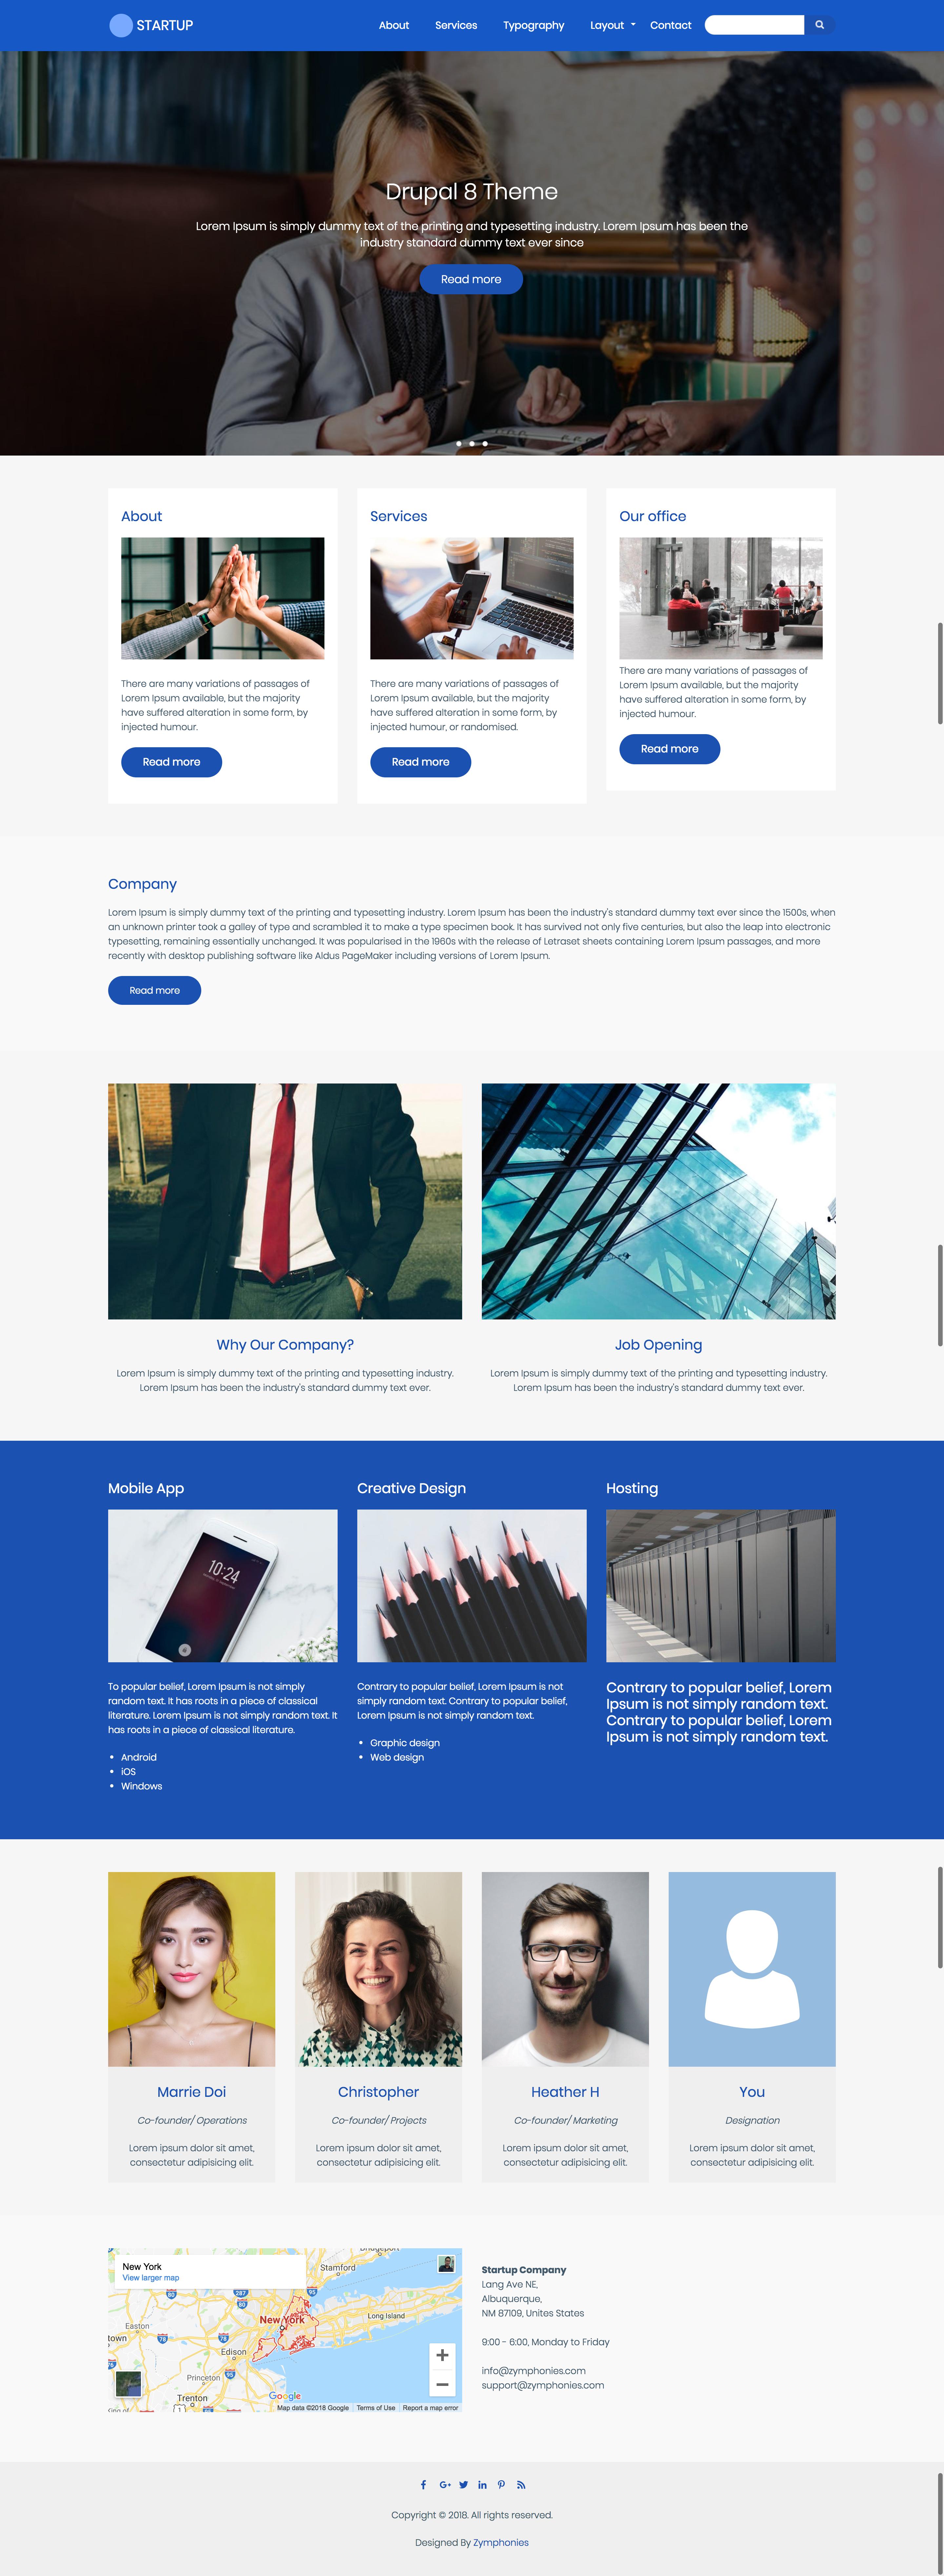 Startup Zymphonies Theme | Drupal org